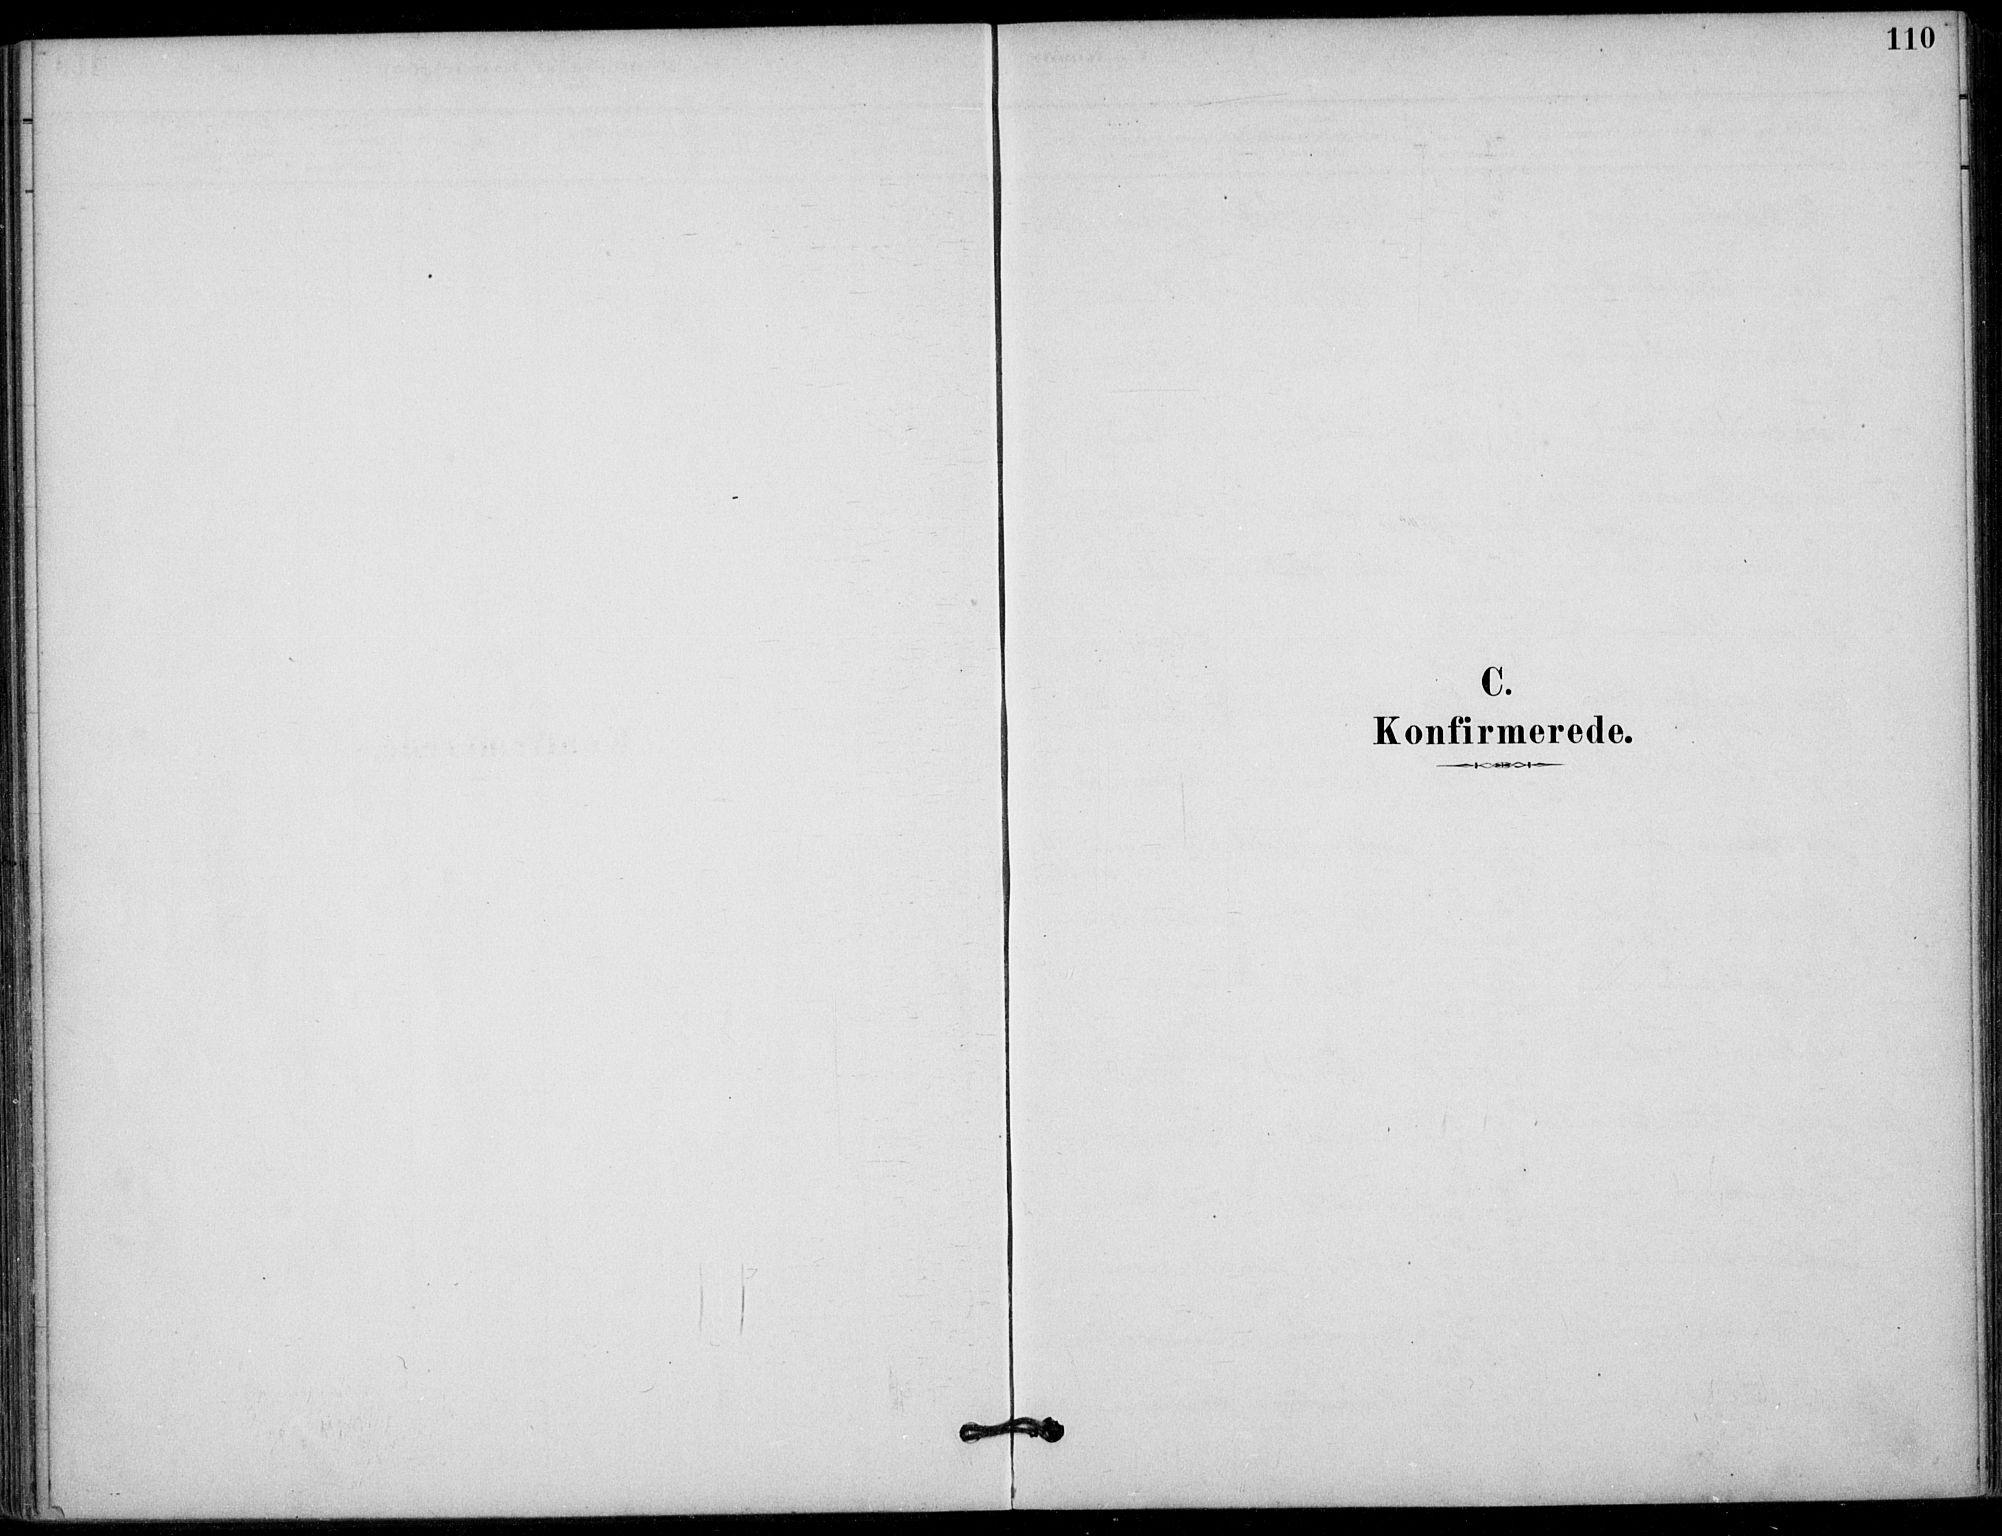 SAKO, Hjartdal kirkebøker, F/Fb/L0002: Ministerialbok nr. II 2, 1880-1932, s. 110